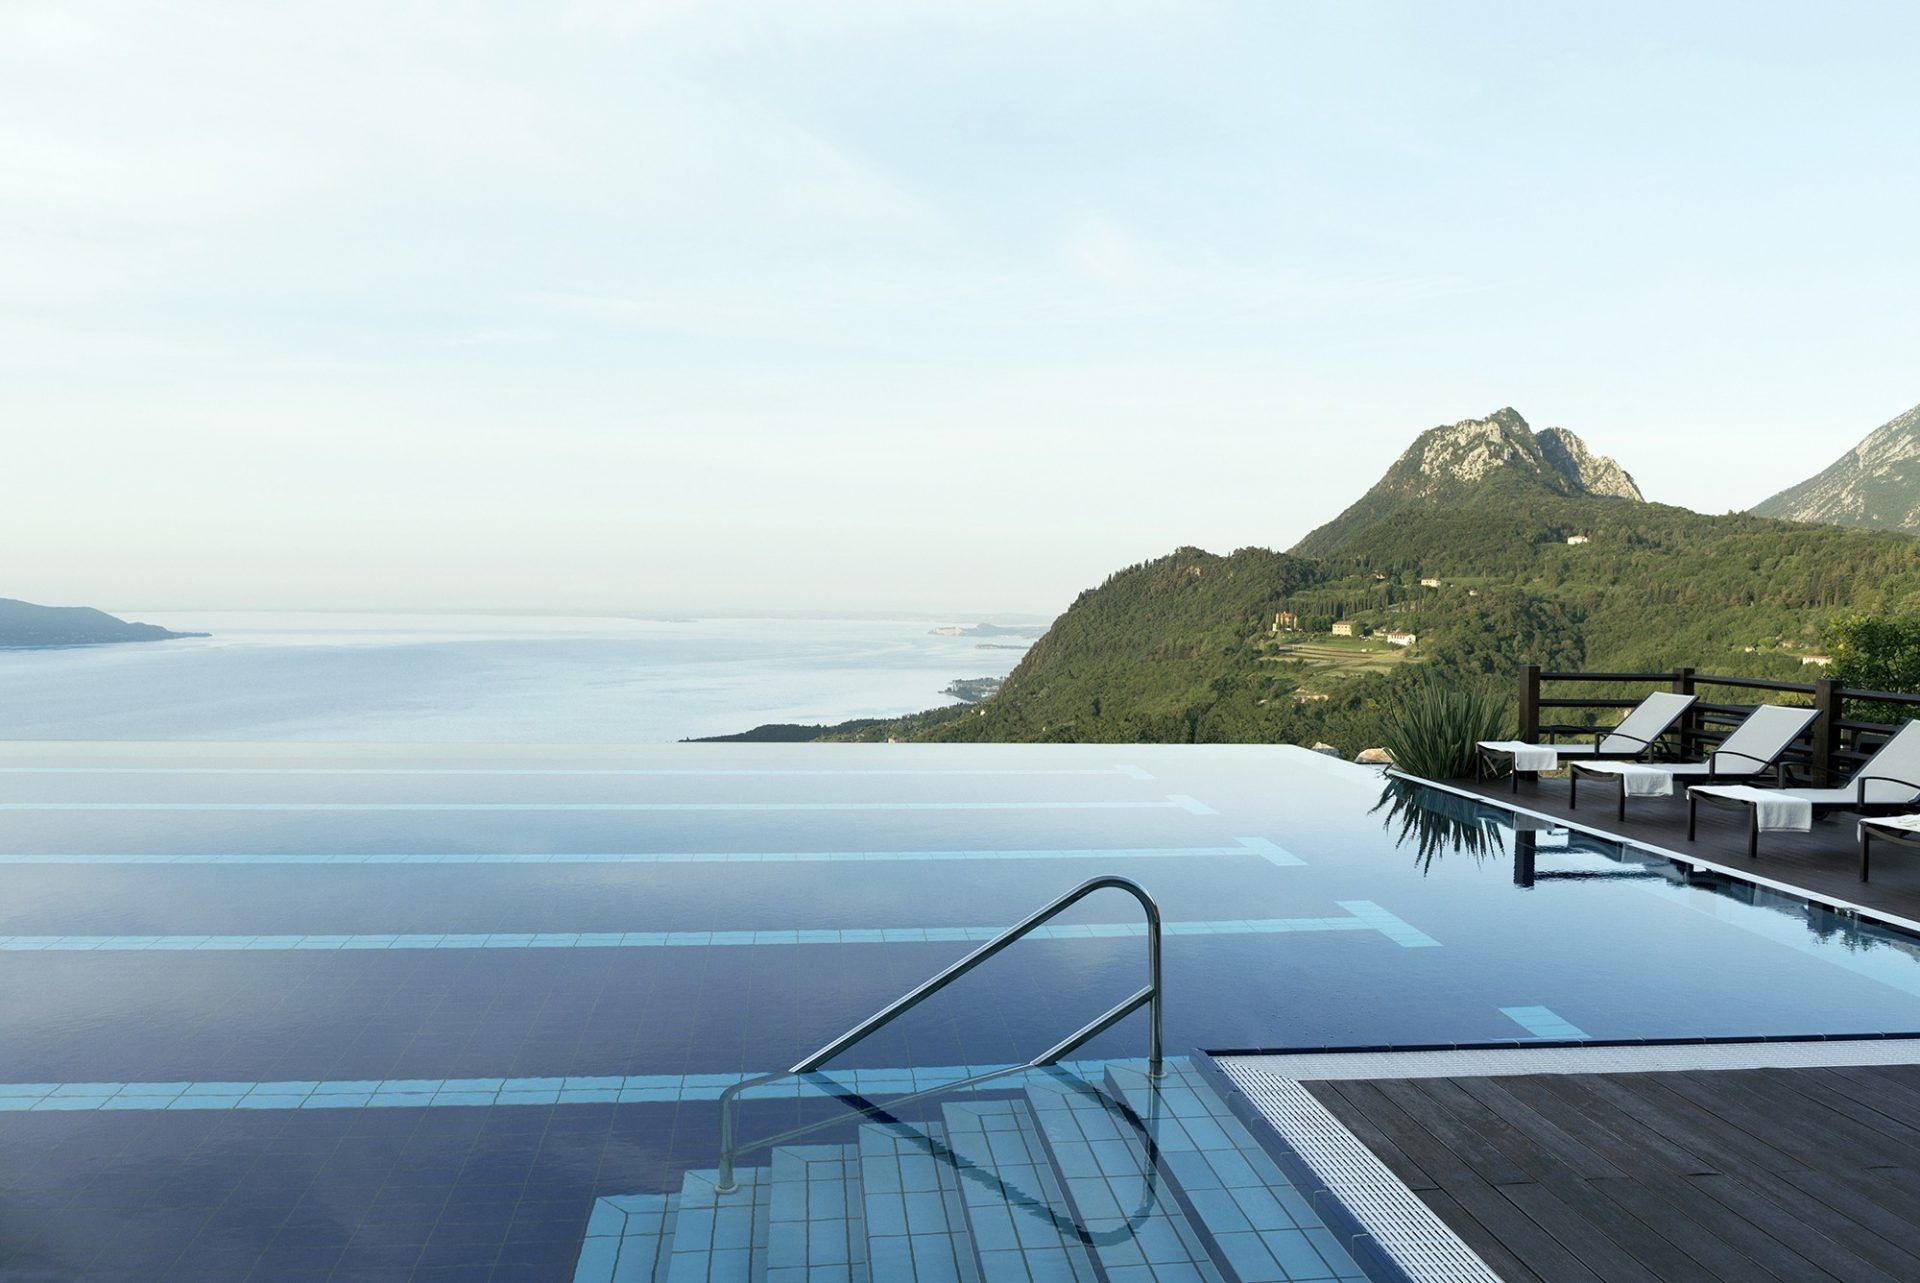 02 Pool Infinity with a view 1920x1283 - Lefay Resort & SPA Lago di Garda, Gardasee